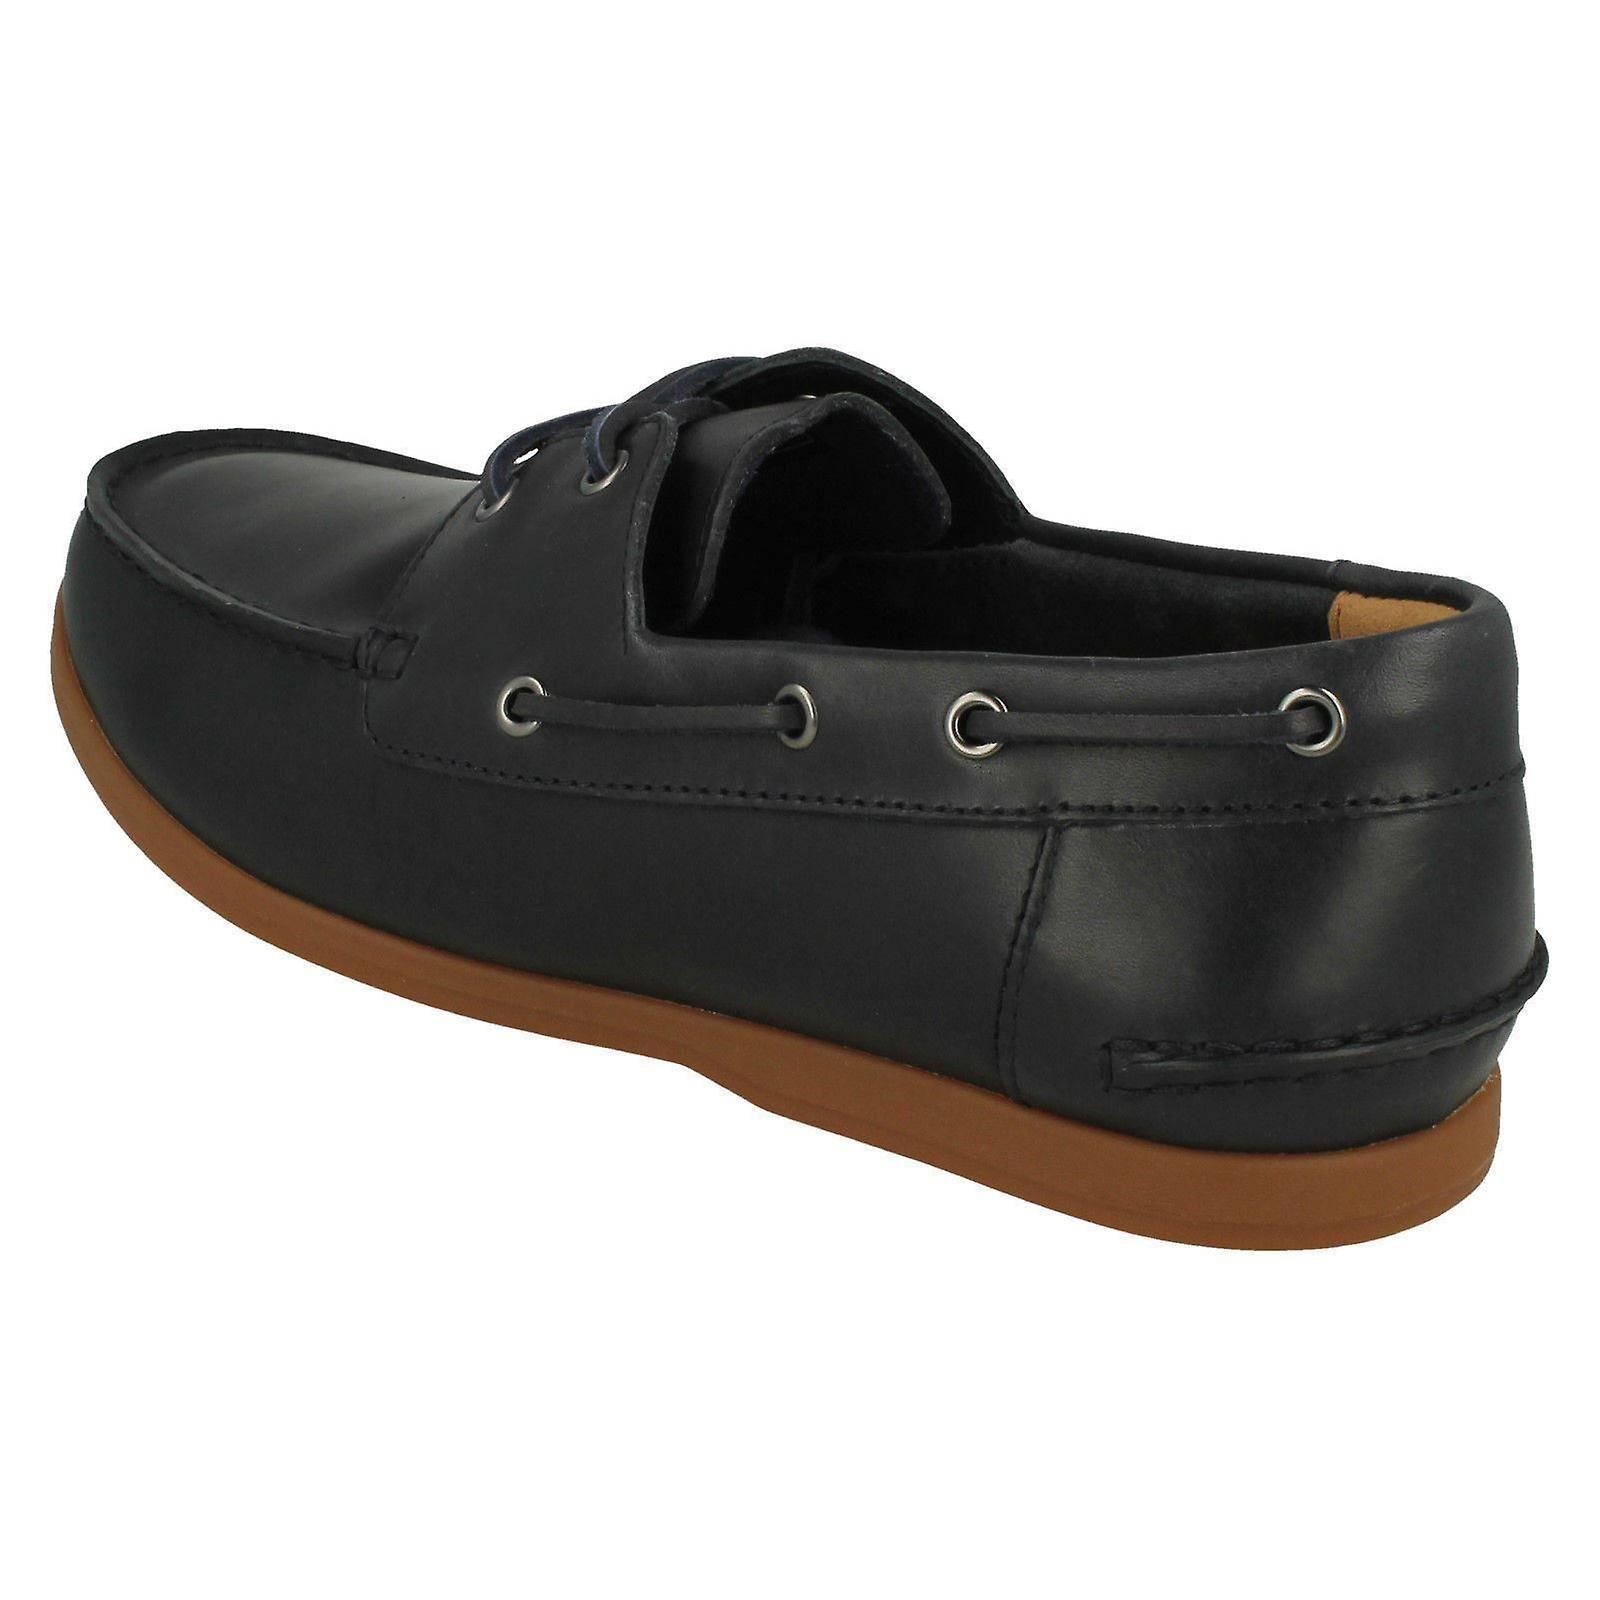 look out for professional design noveldesign Mens Clarks Lace Up Boat Shoes Morven Sail